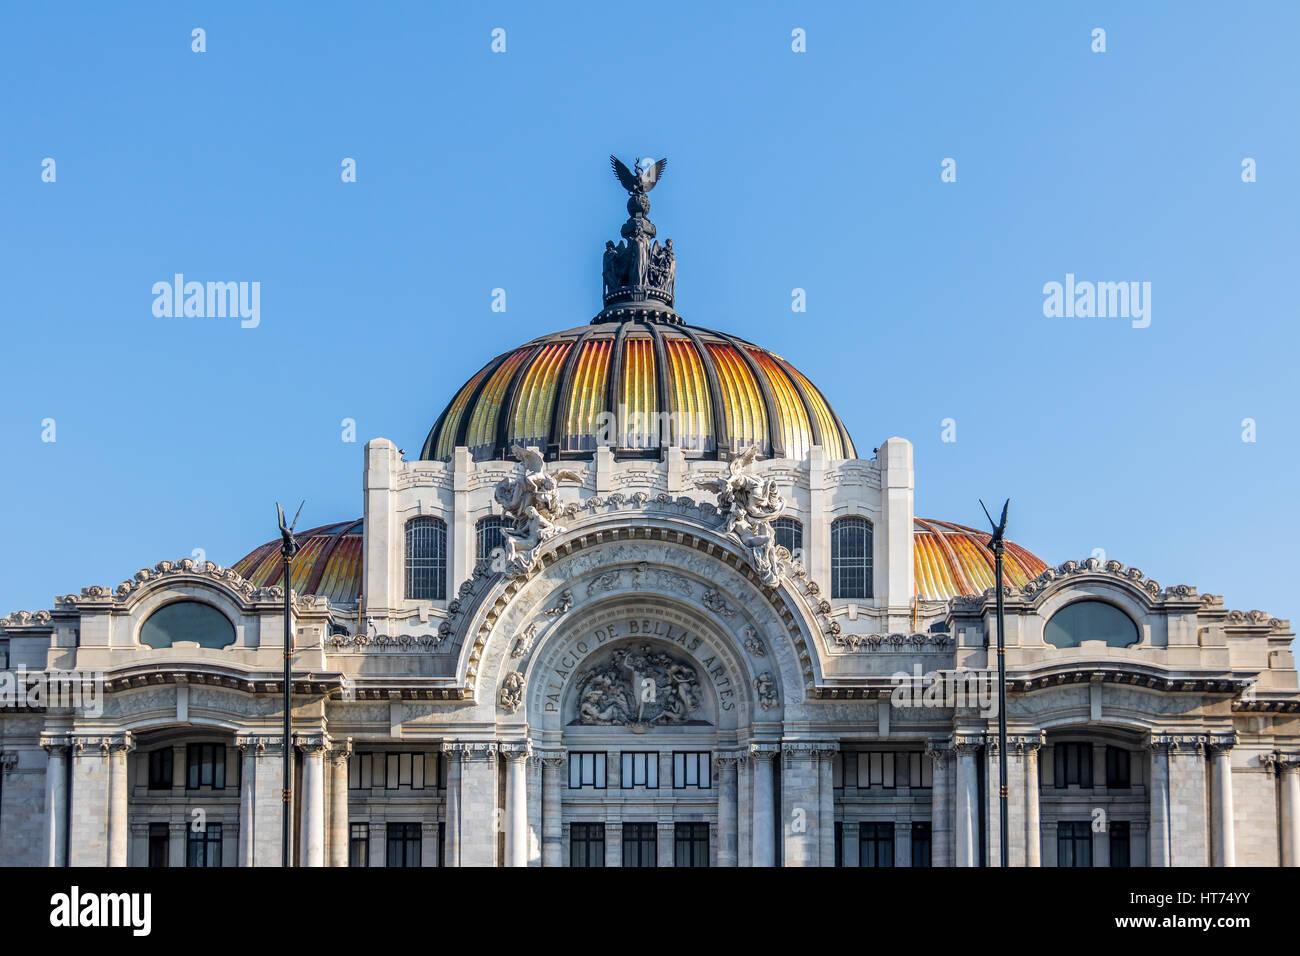 Palacio de Bellas Artes (Palacio de Bellas Artes) - Ciudad de México, México Imagen De Stock